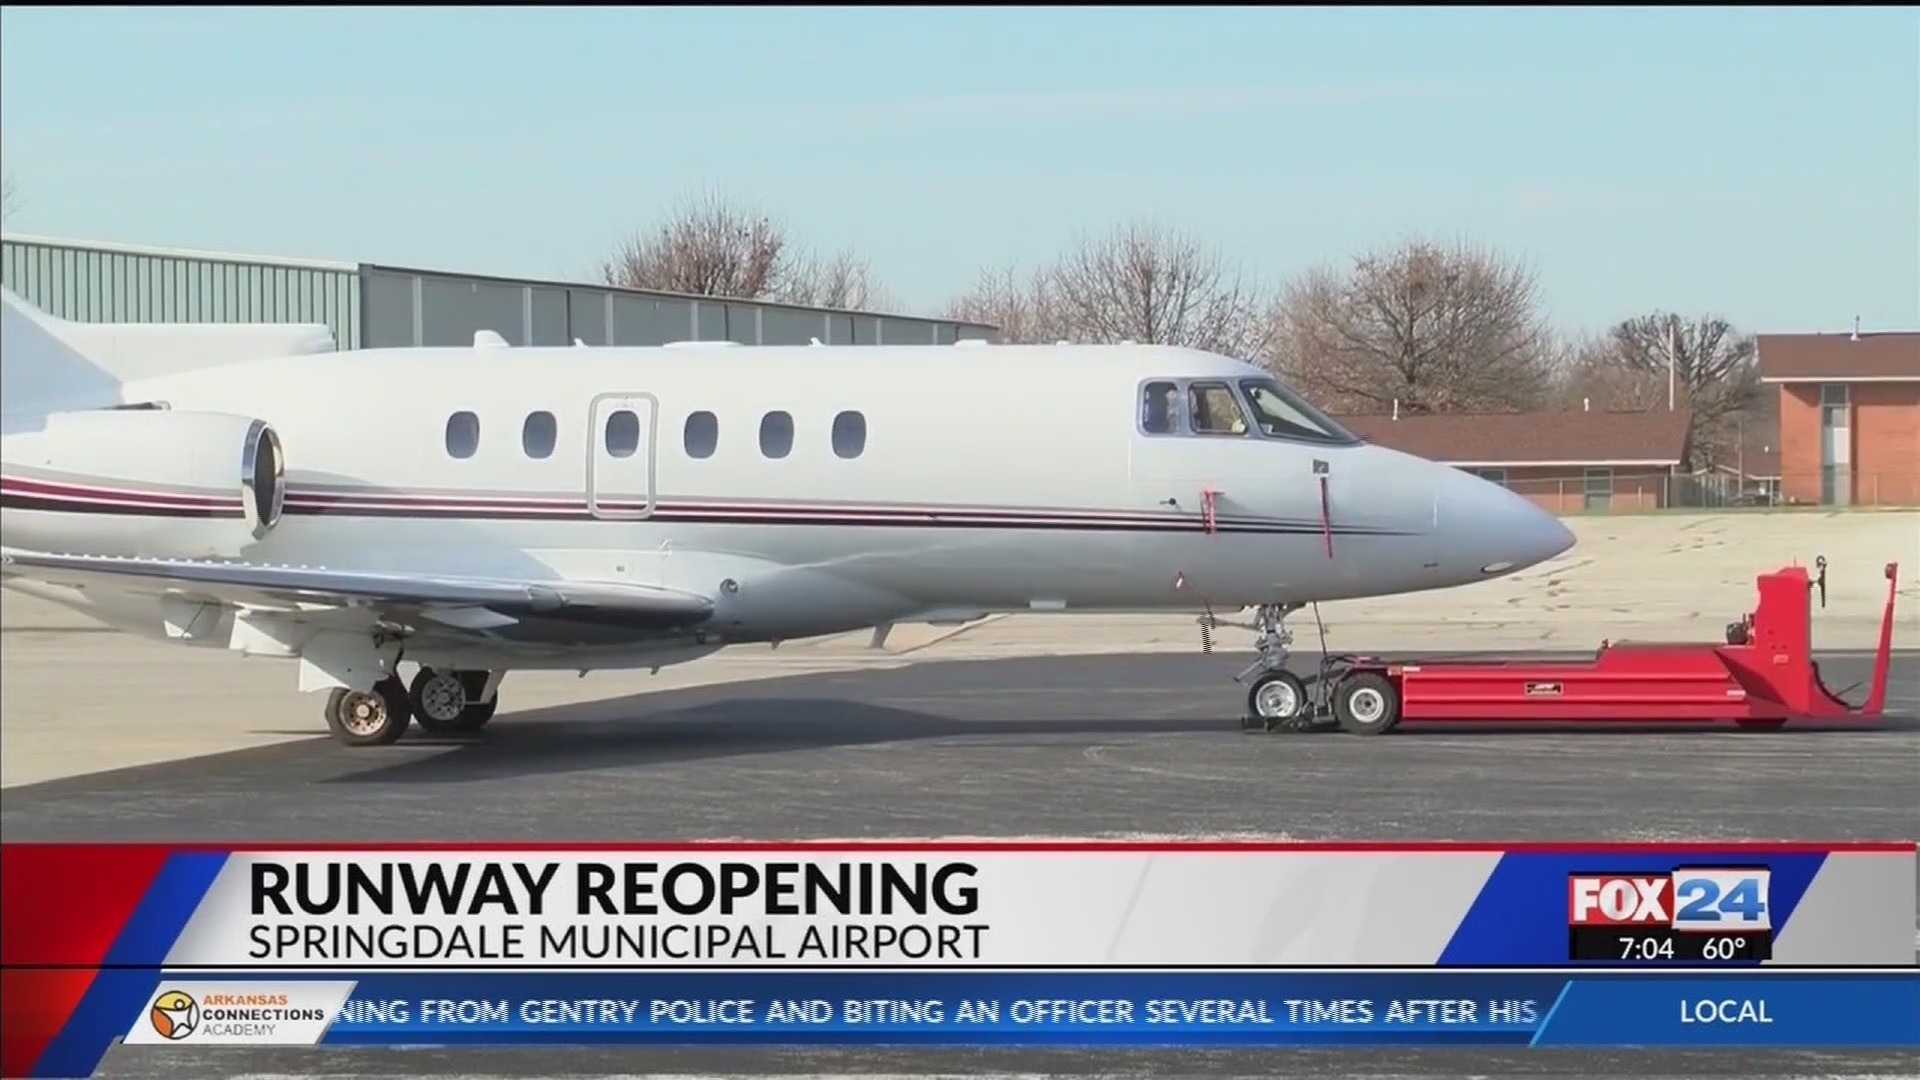 Springdale_Municipal_Airport_Celebrates__0_20181002133307